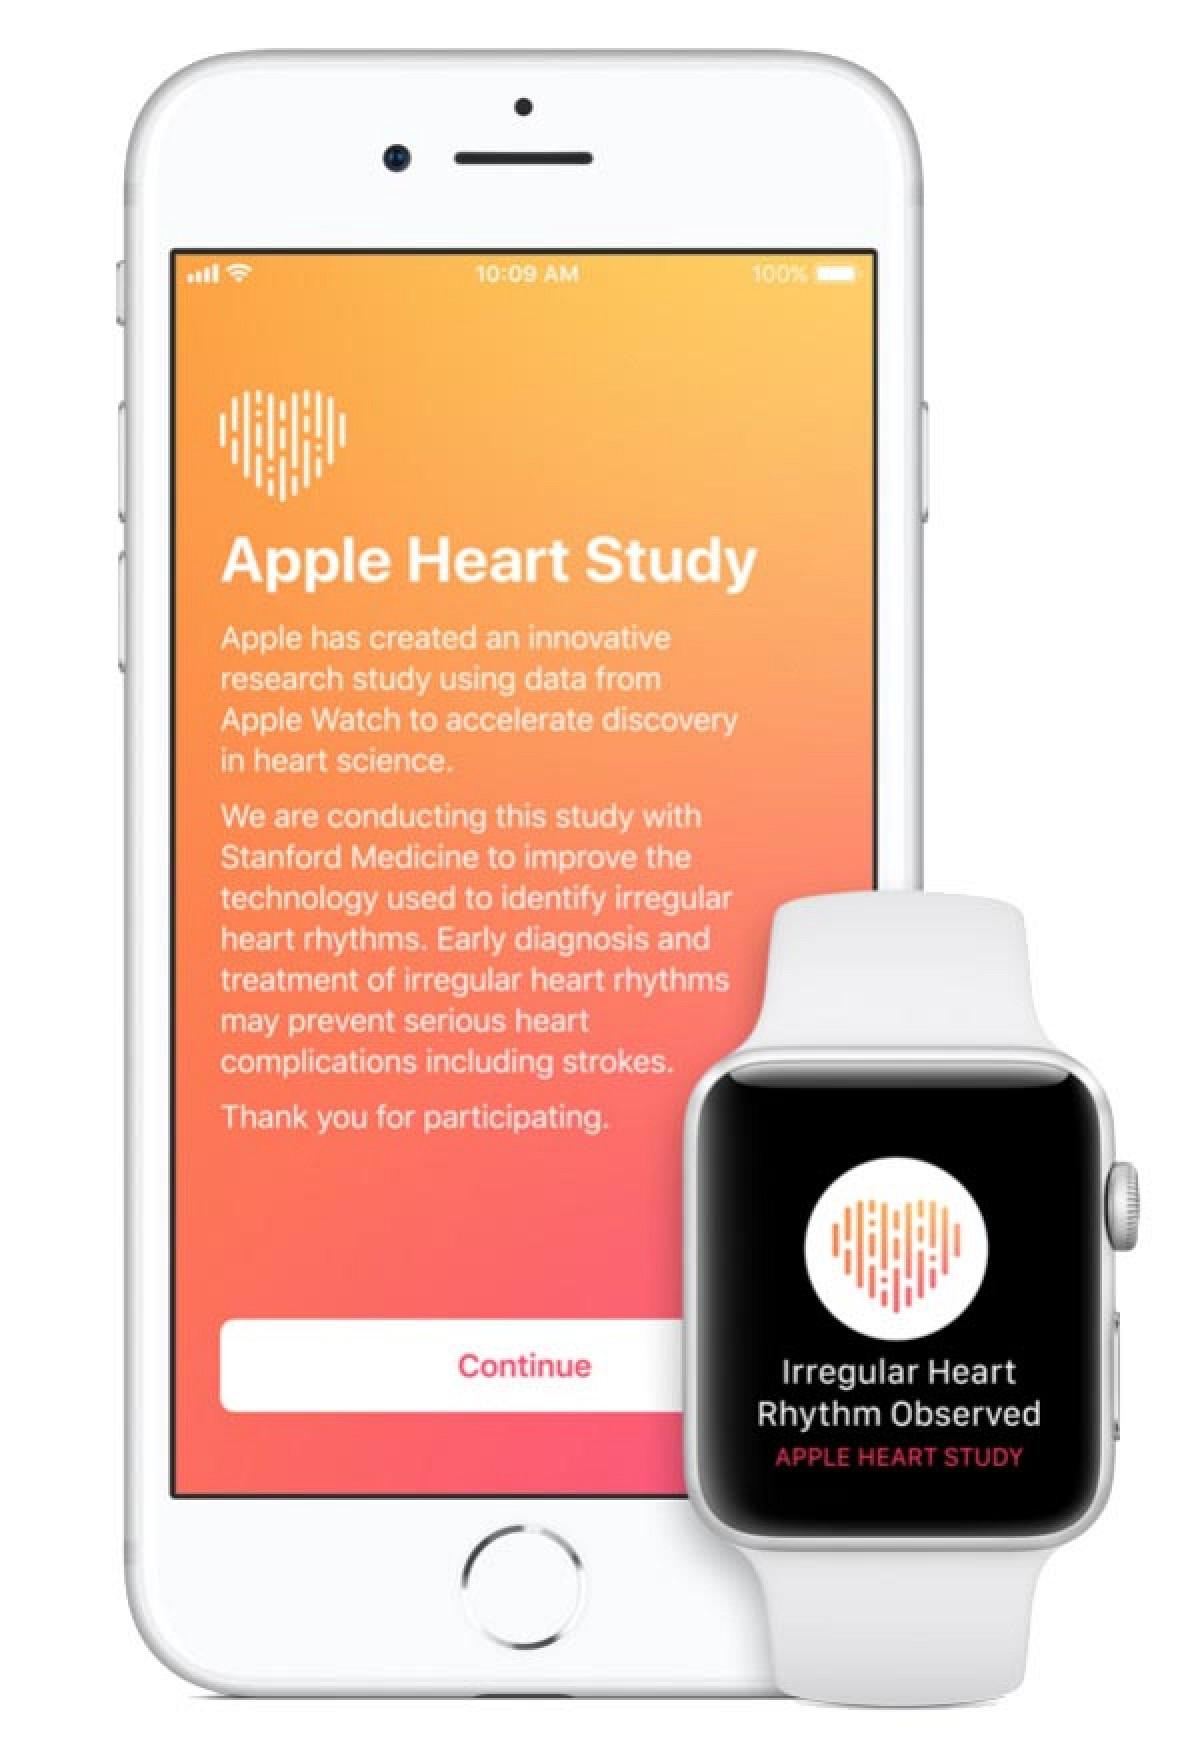 Apple Heart Study Launching on App Store to Identify Irregular Heart Rhythms